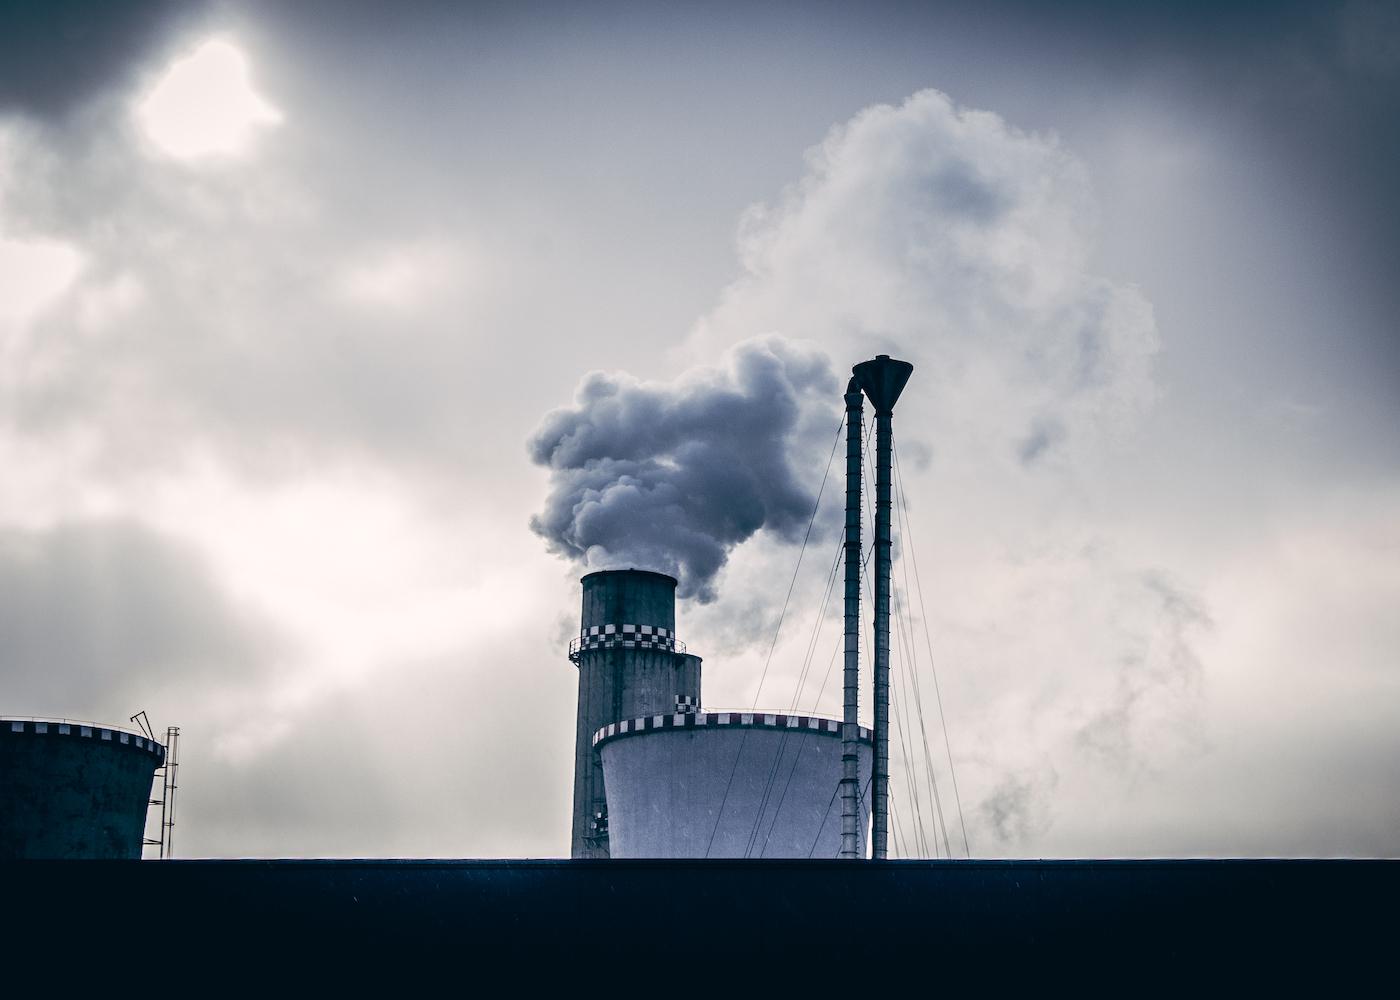 utsläppsrätter - Photo by Claudiu Sergiu Danaila